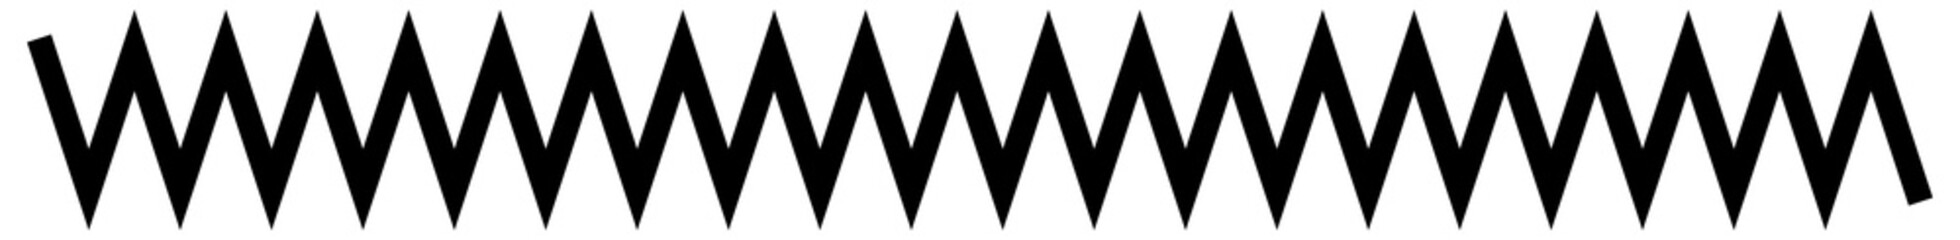 Wavy, waving  lines. Zig-zag, criss-cross lines vector illustration. Undulate, billowy effect lines Wall mural